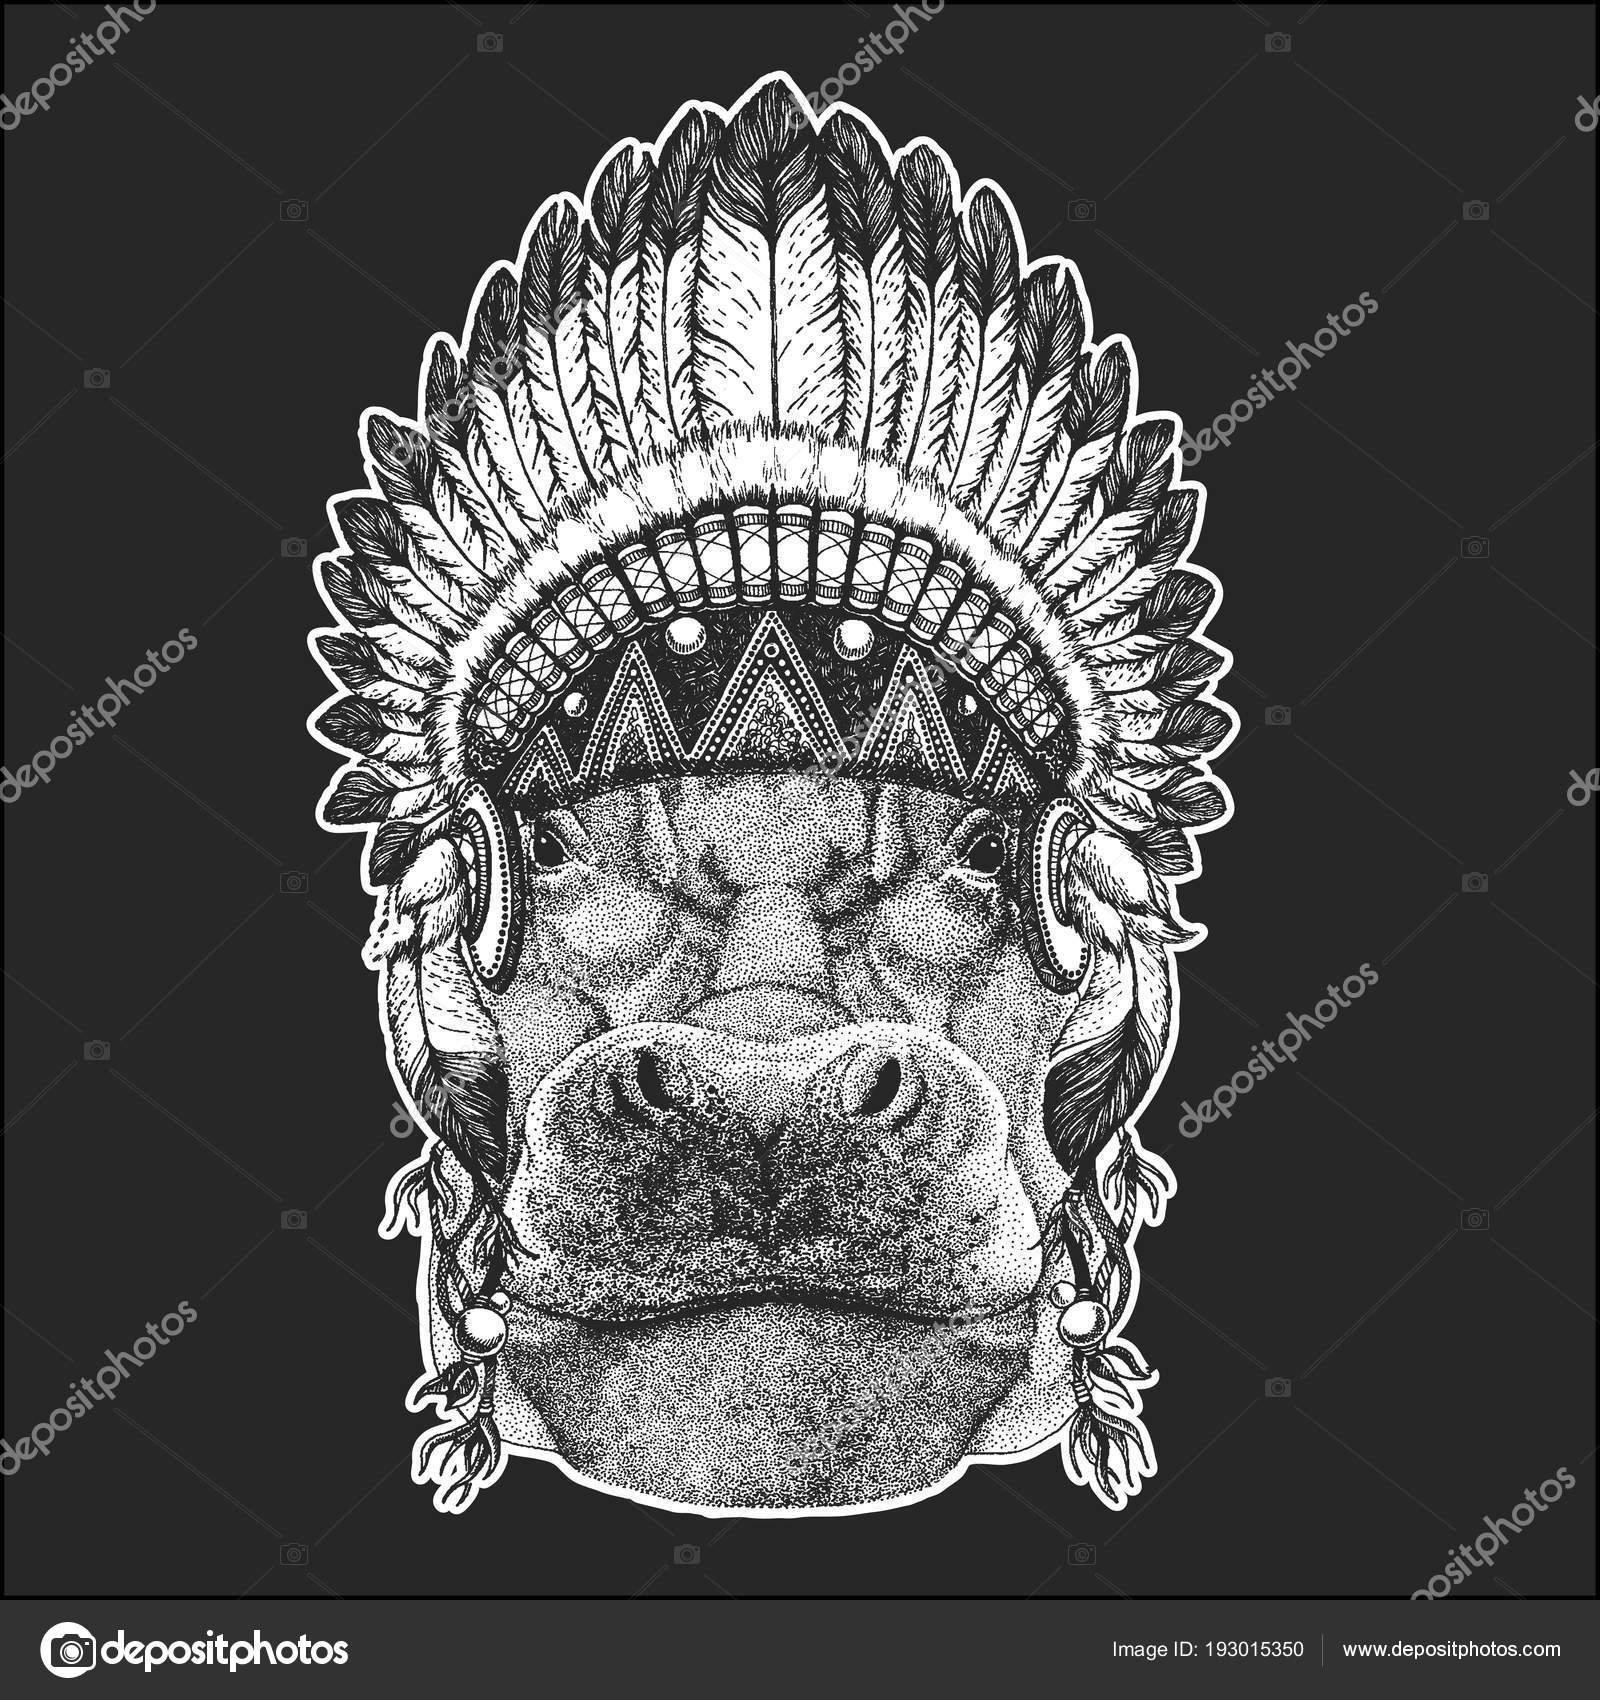 Hippopotamus Tattoo Hippo Hippopotamus Behemoth River Horse Cool Animal Wearing Native American Indian Headdress With Feathers Boho Chic Style Hand Drawn Image For Tattoo Emblem Badge Logo Patch Stock Vector C